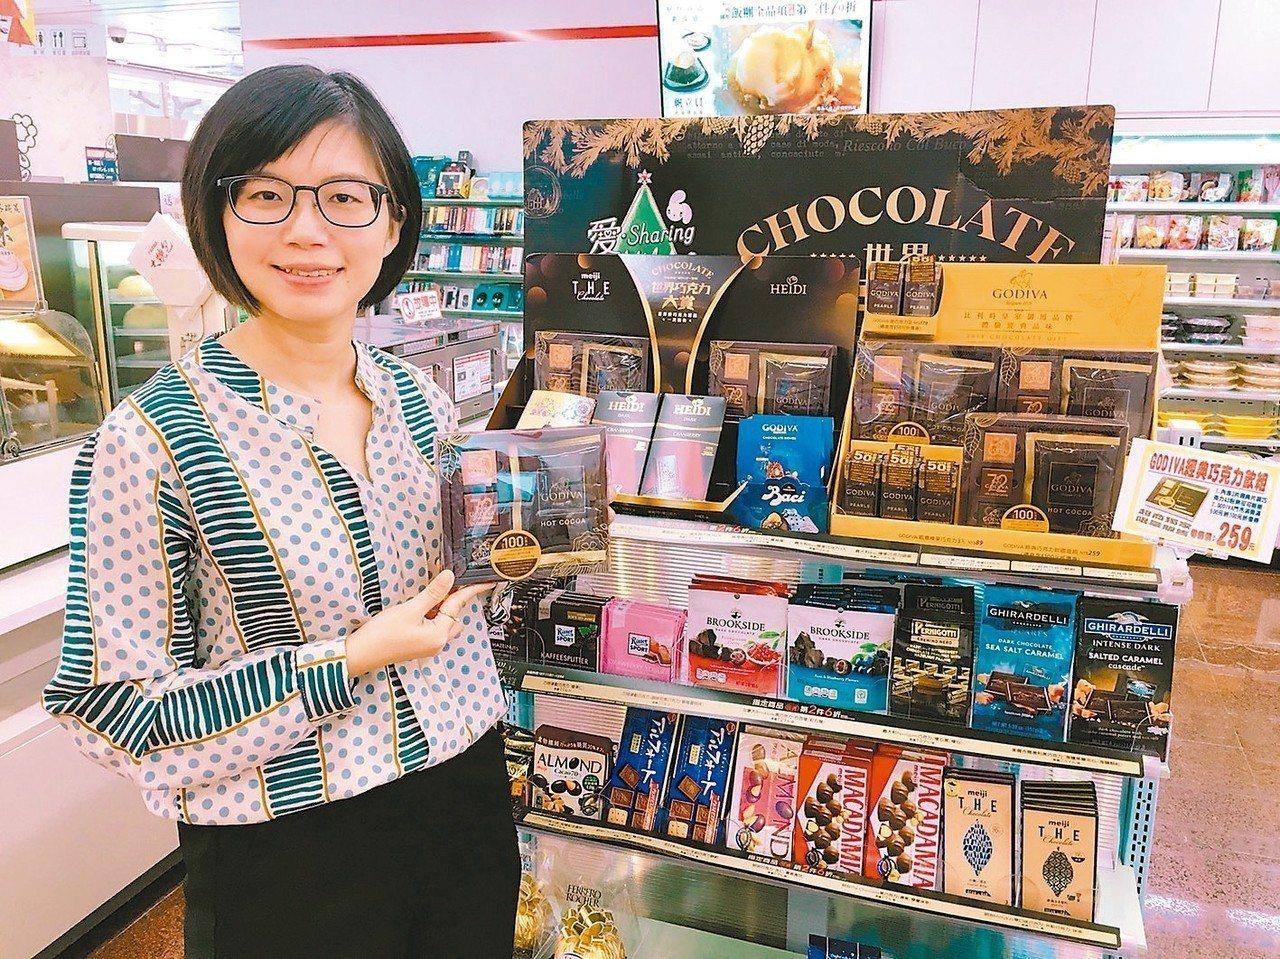 7-ELEVEN門市即日起至12/4推出「愛sharing世界巧克力大賞」,集結...